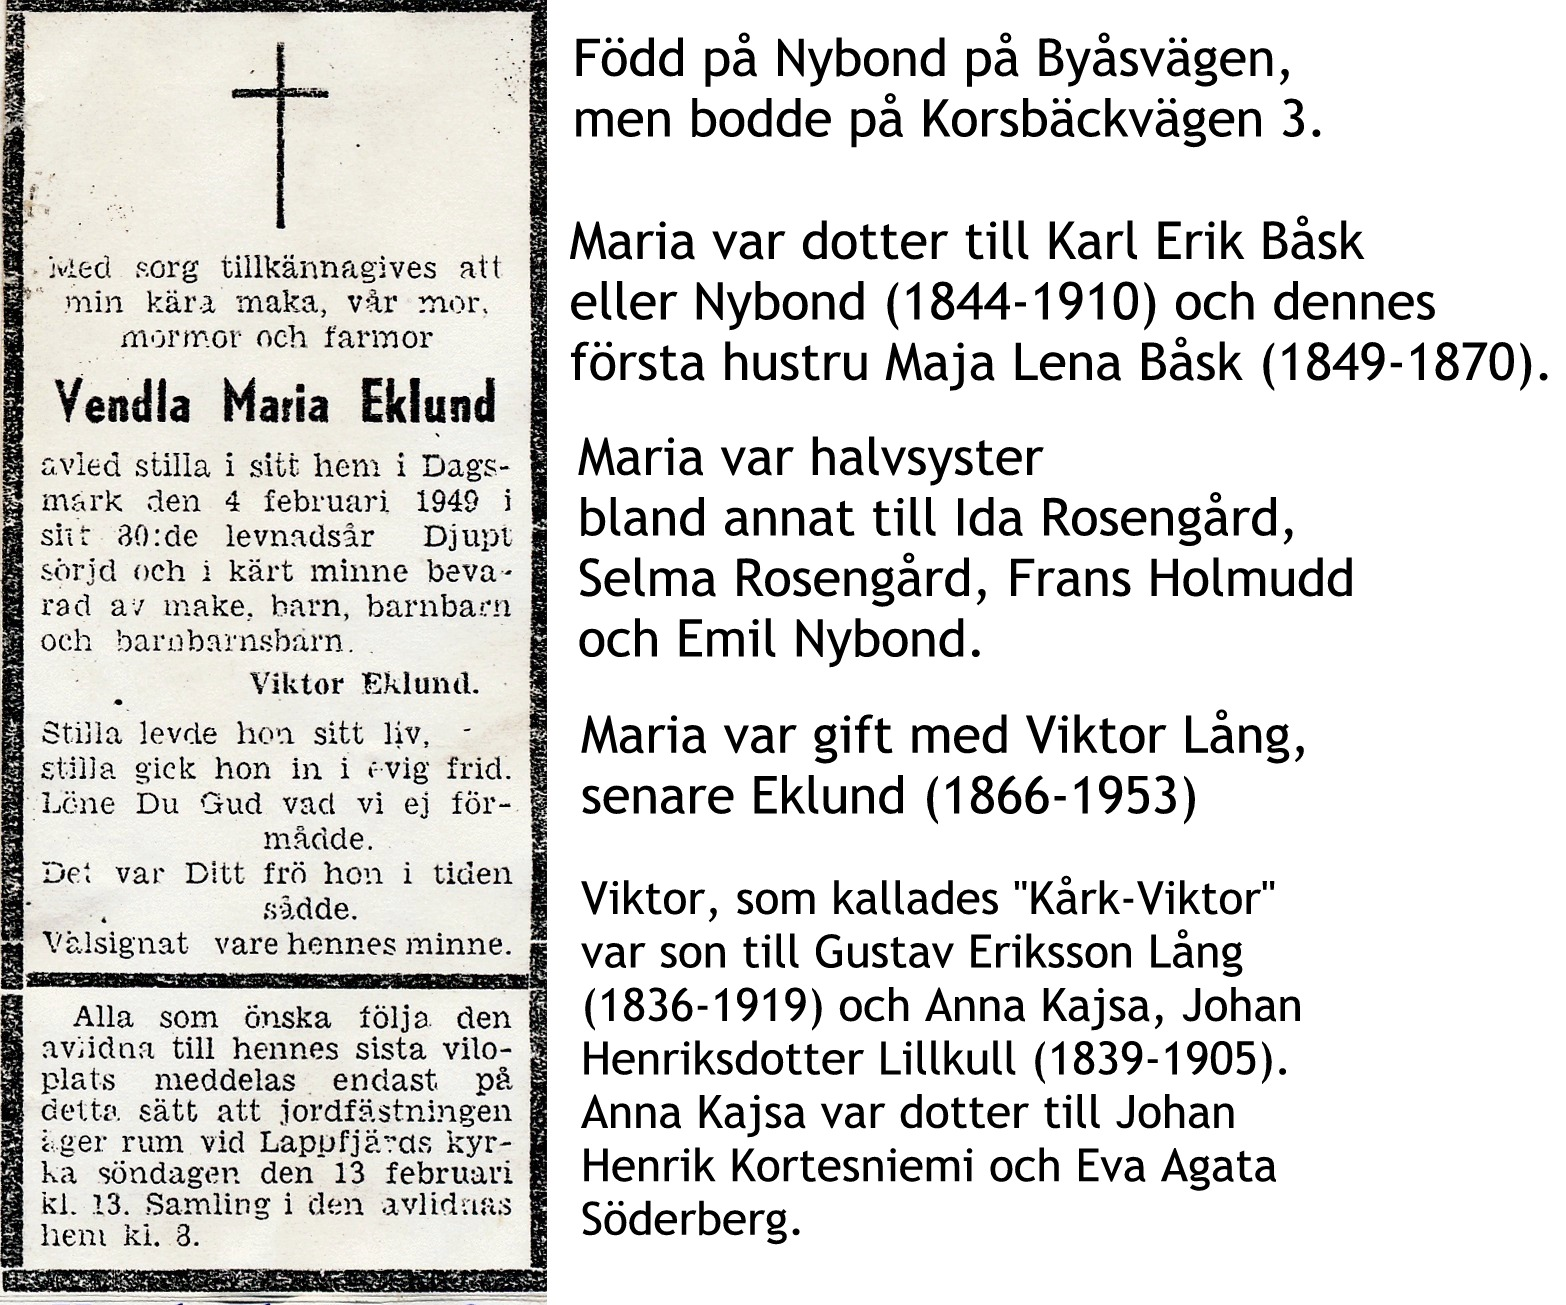 Eklund Vendla Maria